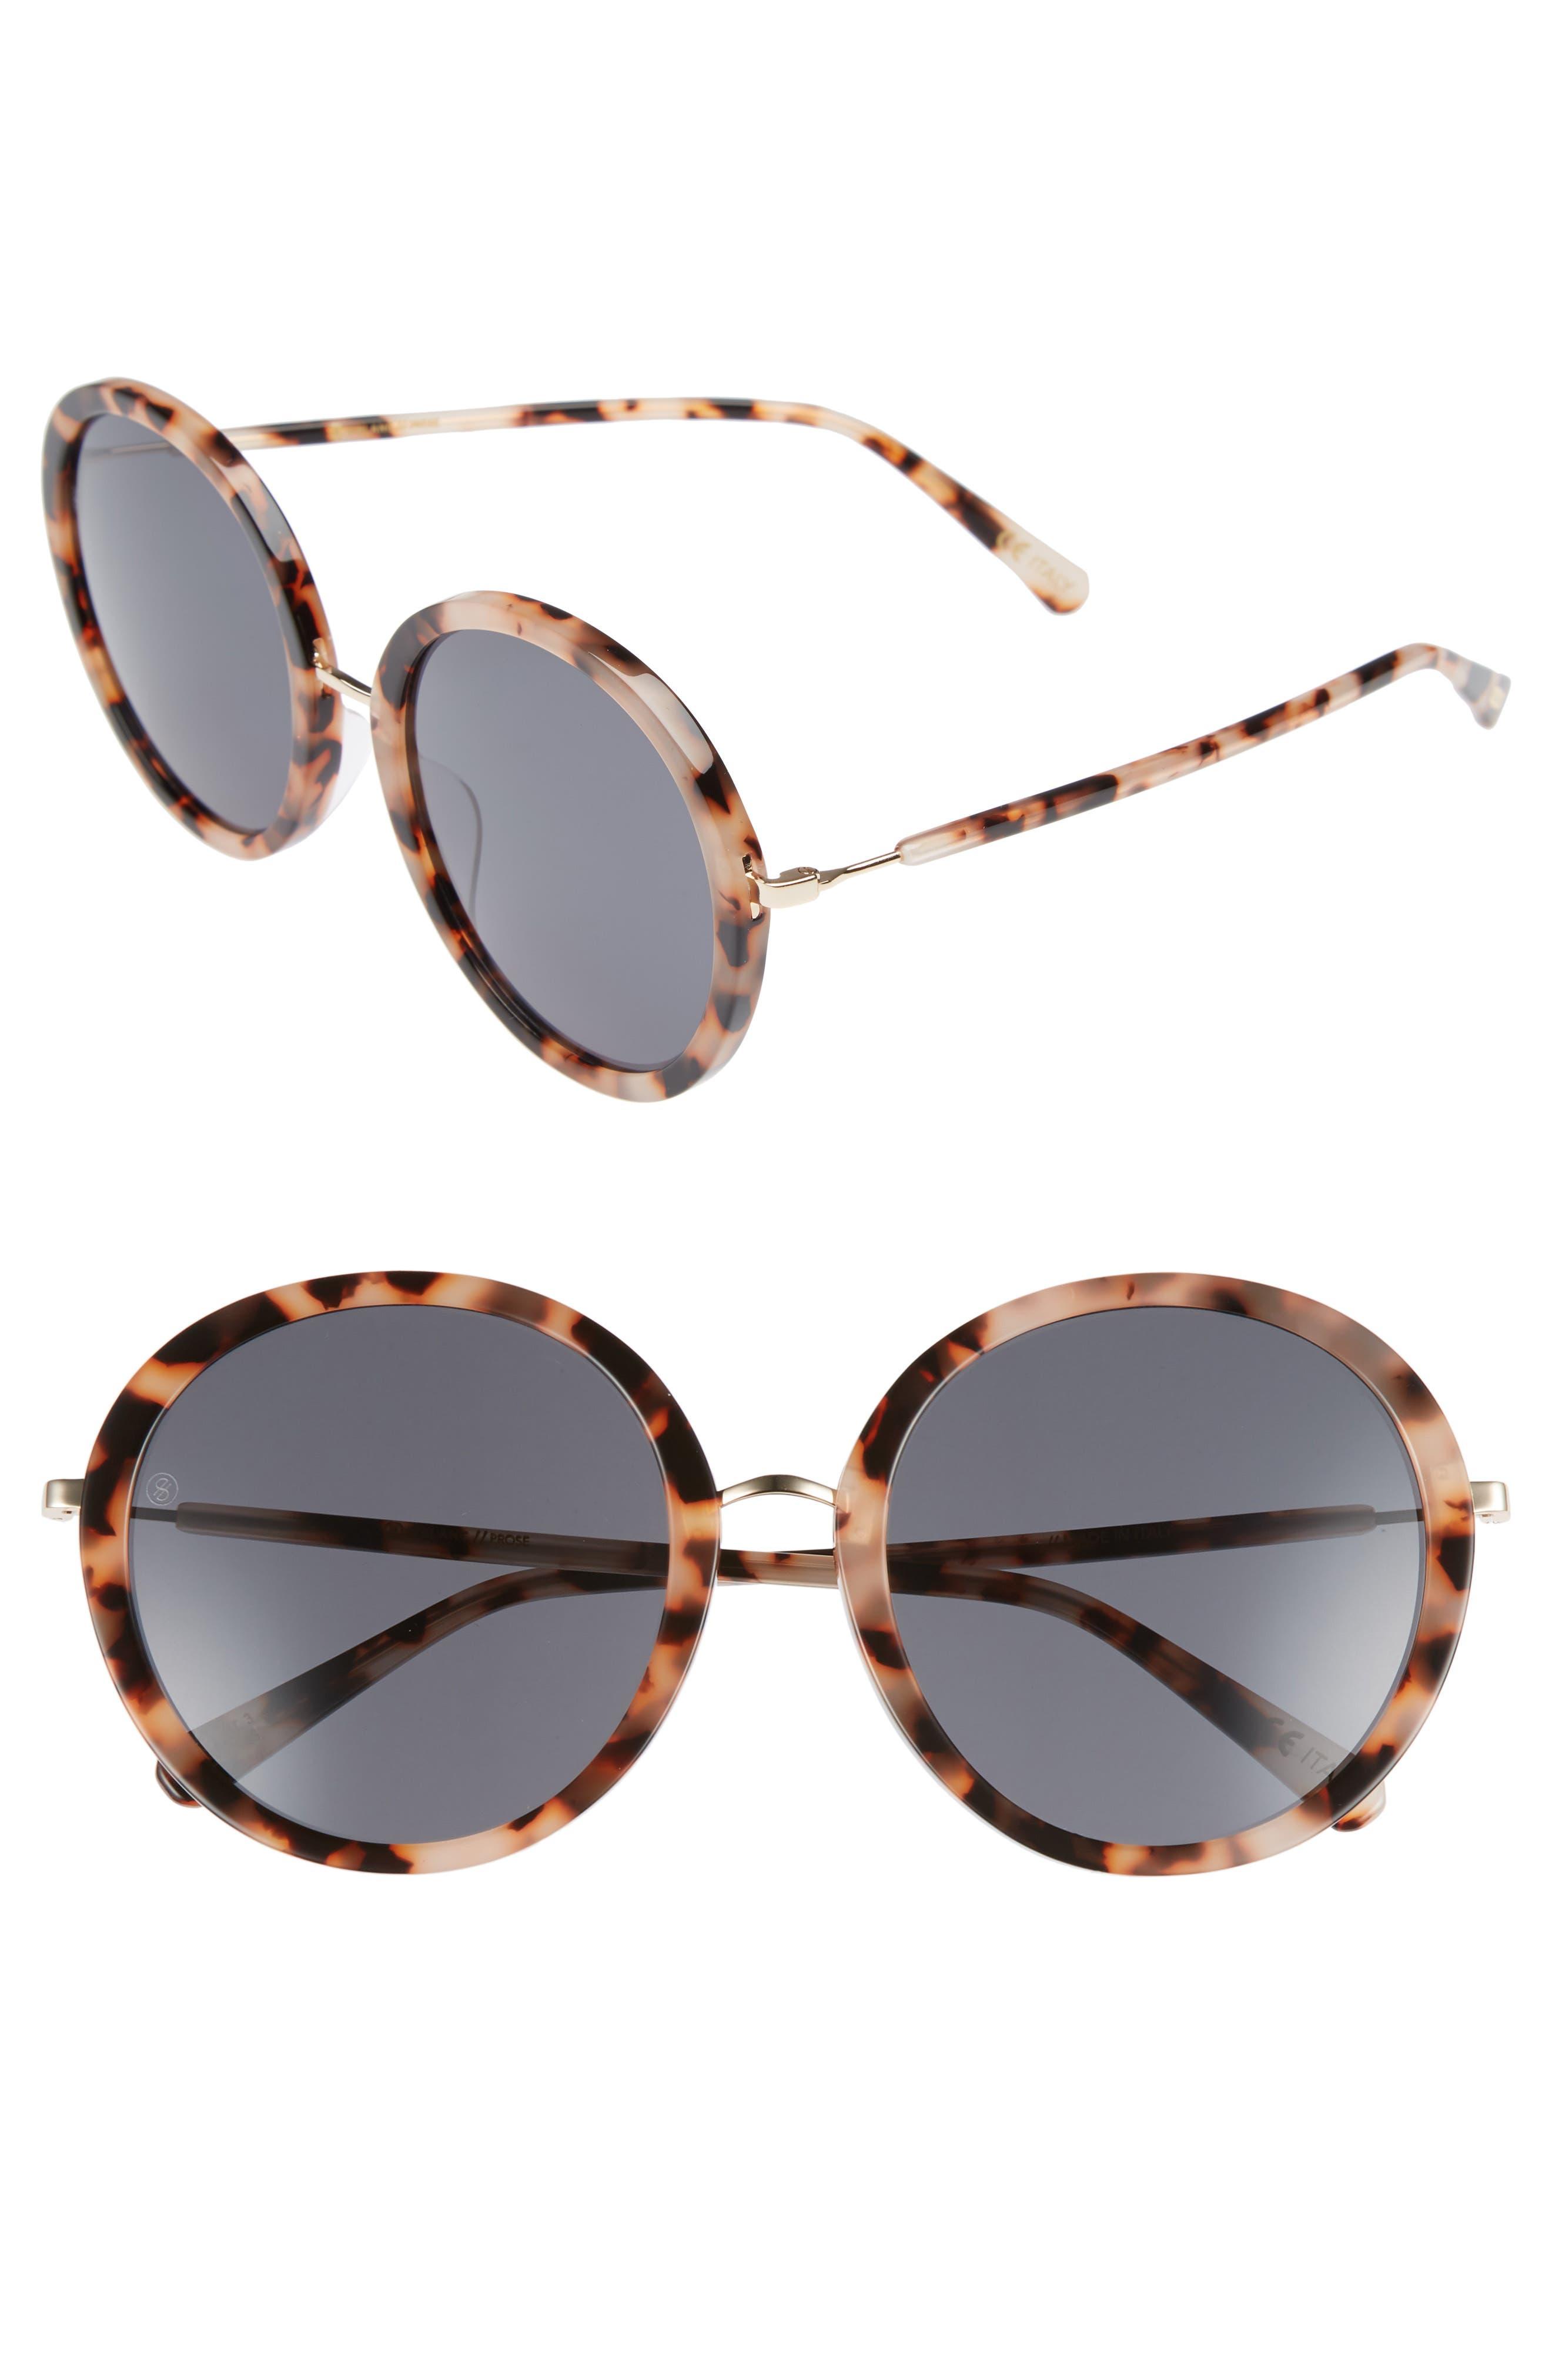 D'BLANC Prose 56mm Round Sunglasses,                             Main thumbnail 1, color,                             200